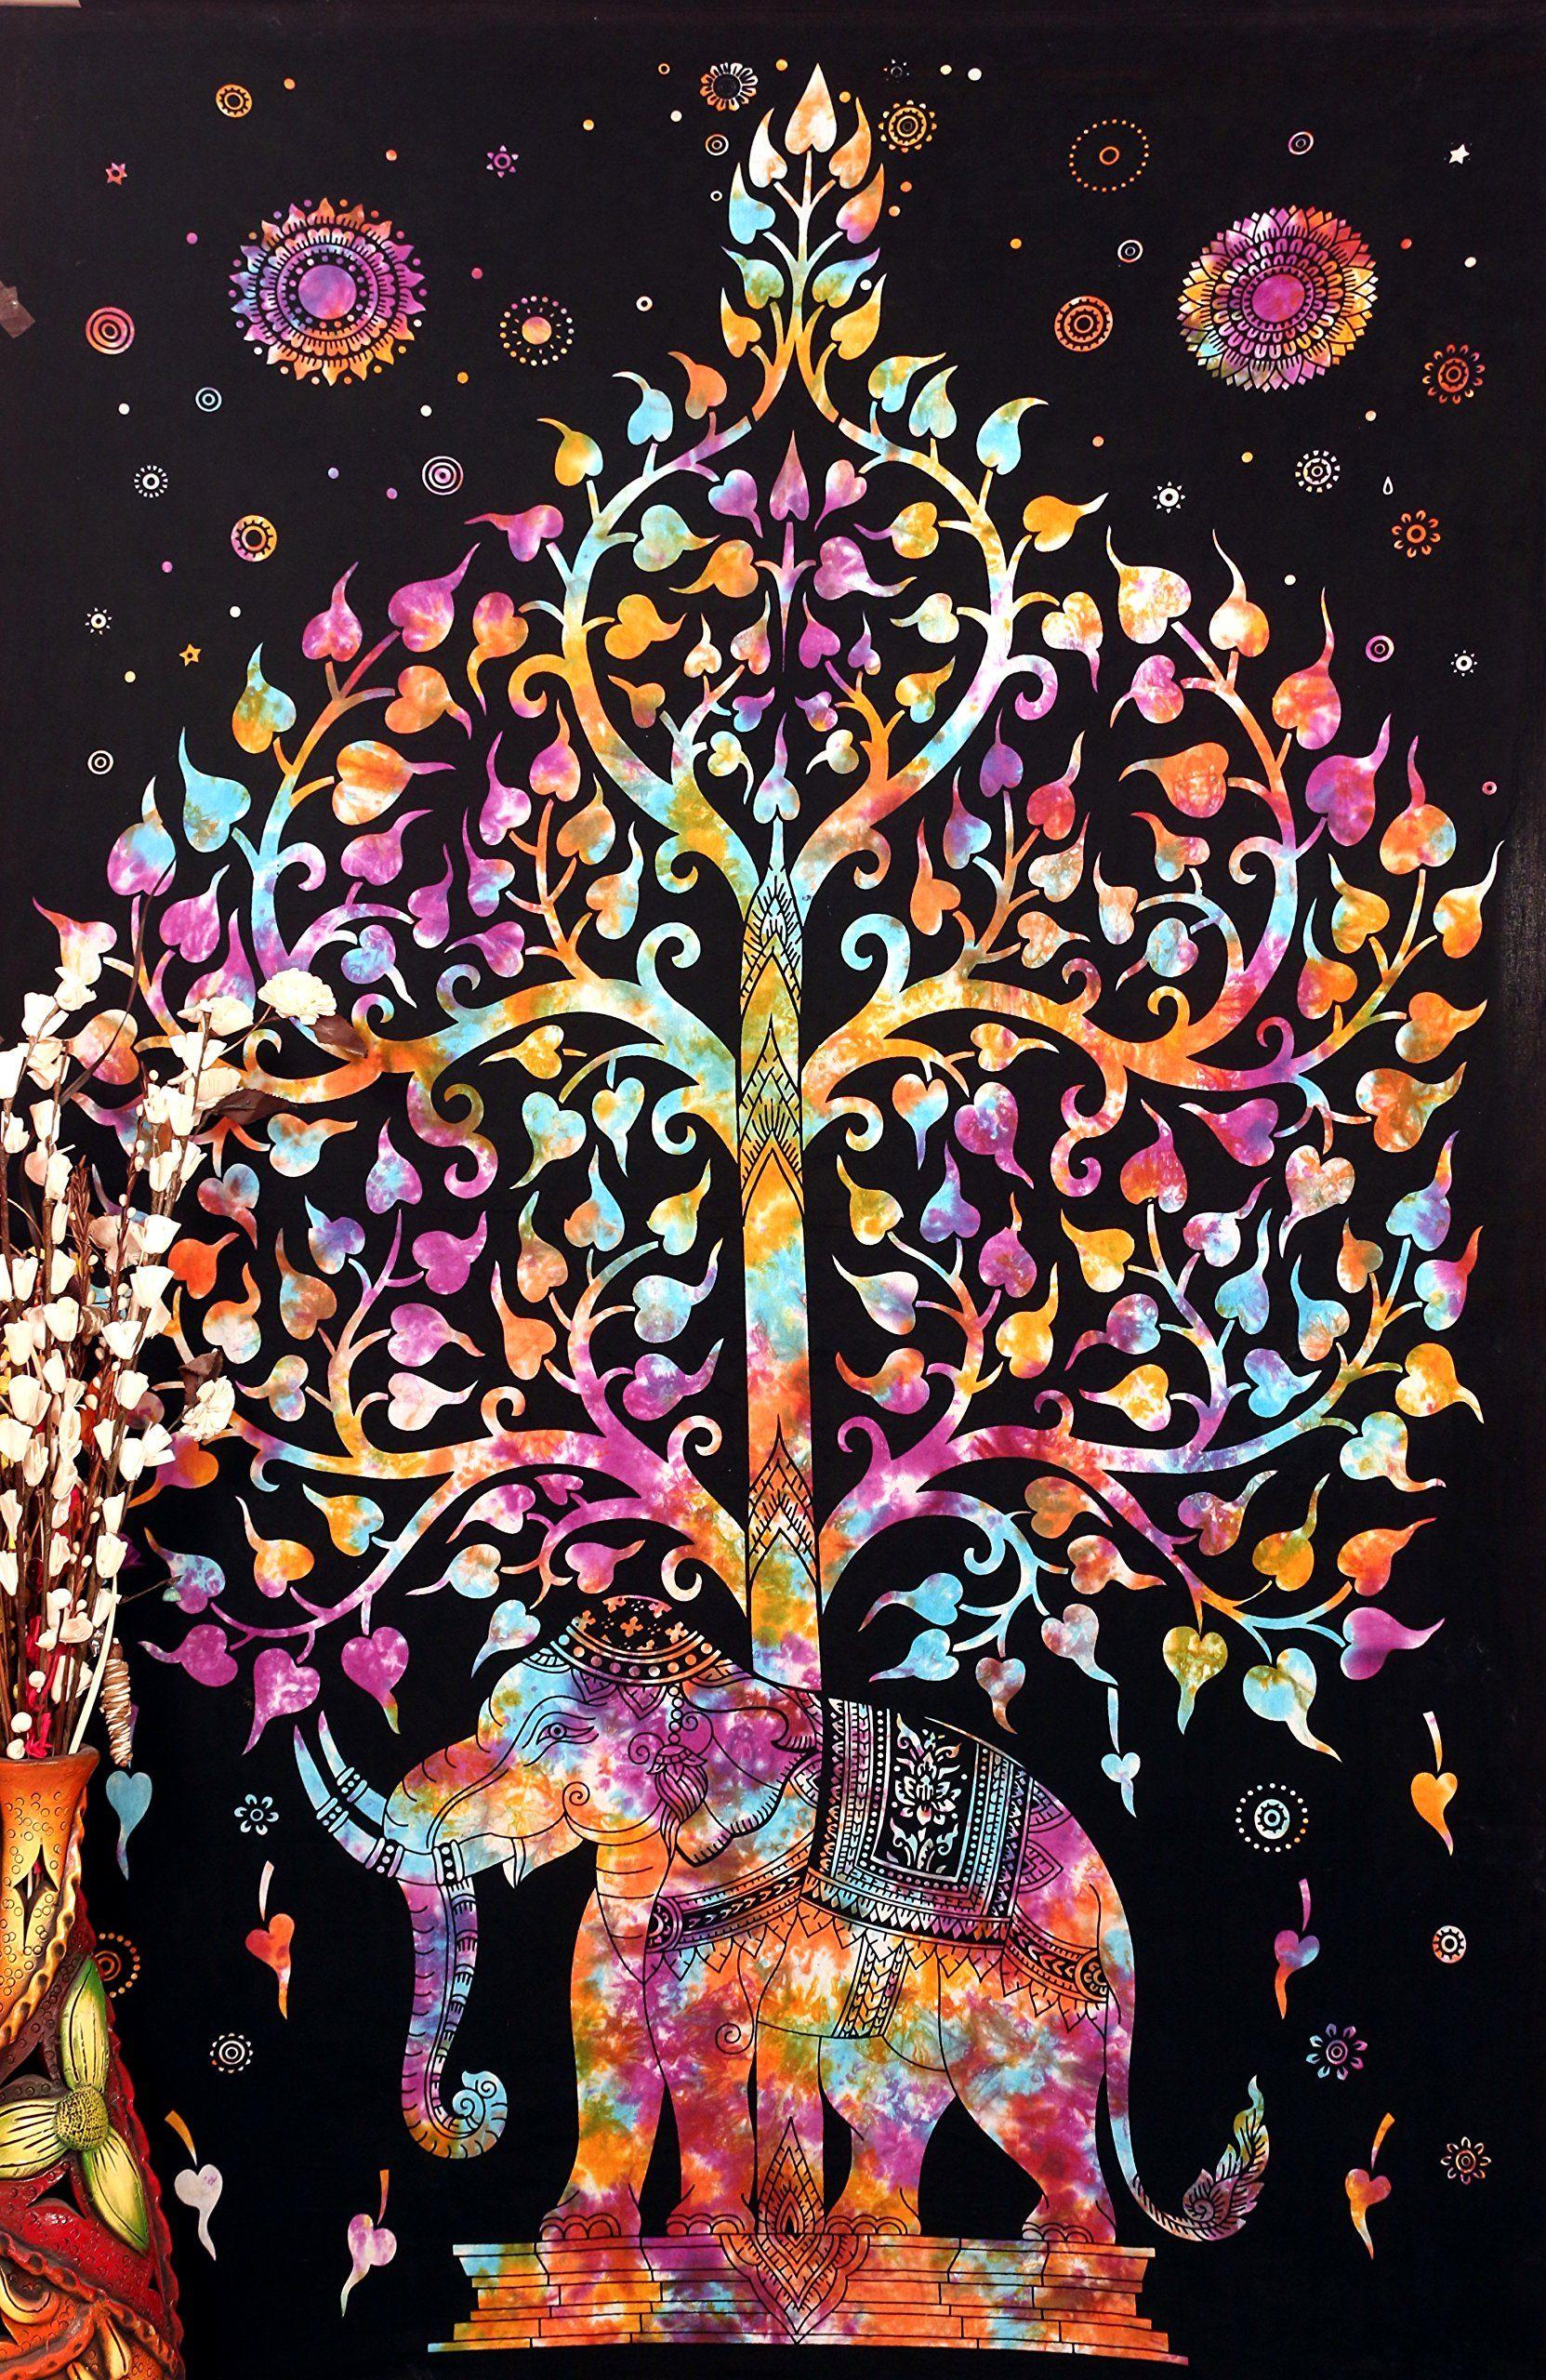 Indian Mandala Elephant Tree Of Life Wall Hanging Tapestry Throw Dorm Decor Art